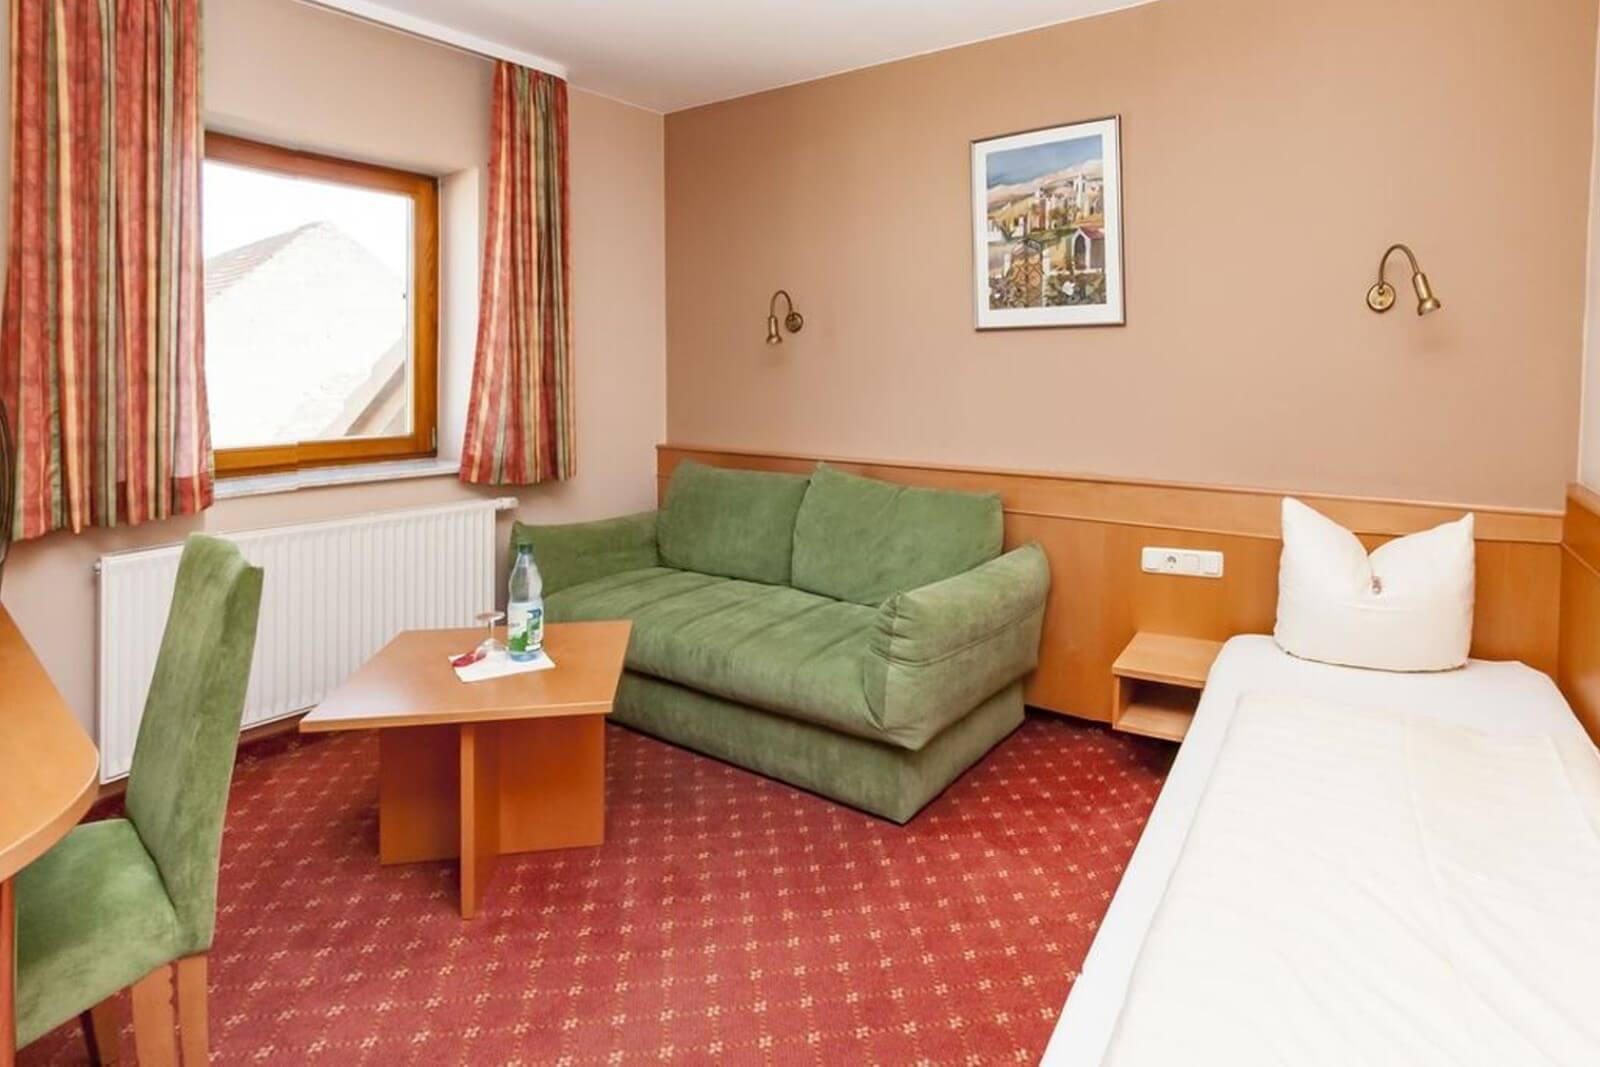 einzelzimmer-komfort-hotel-pension-bett-fruehstueck-riedstadt2